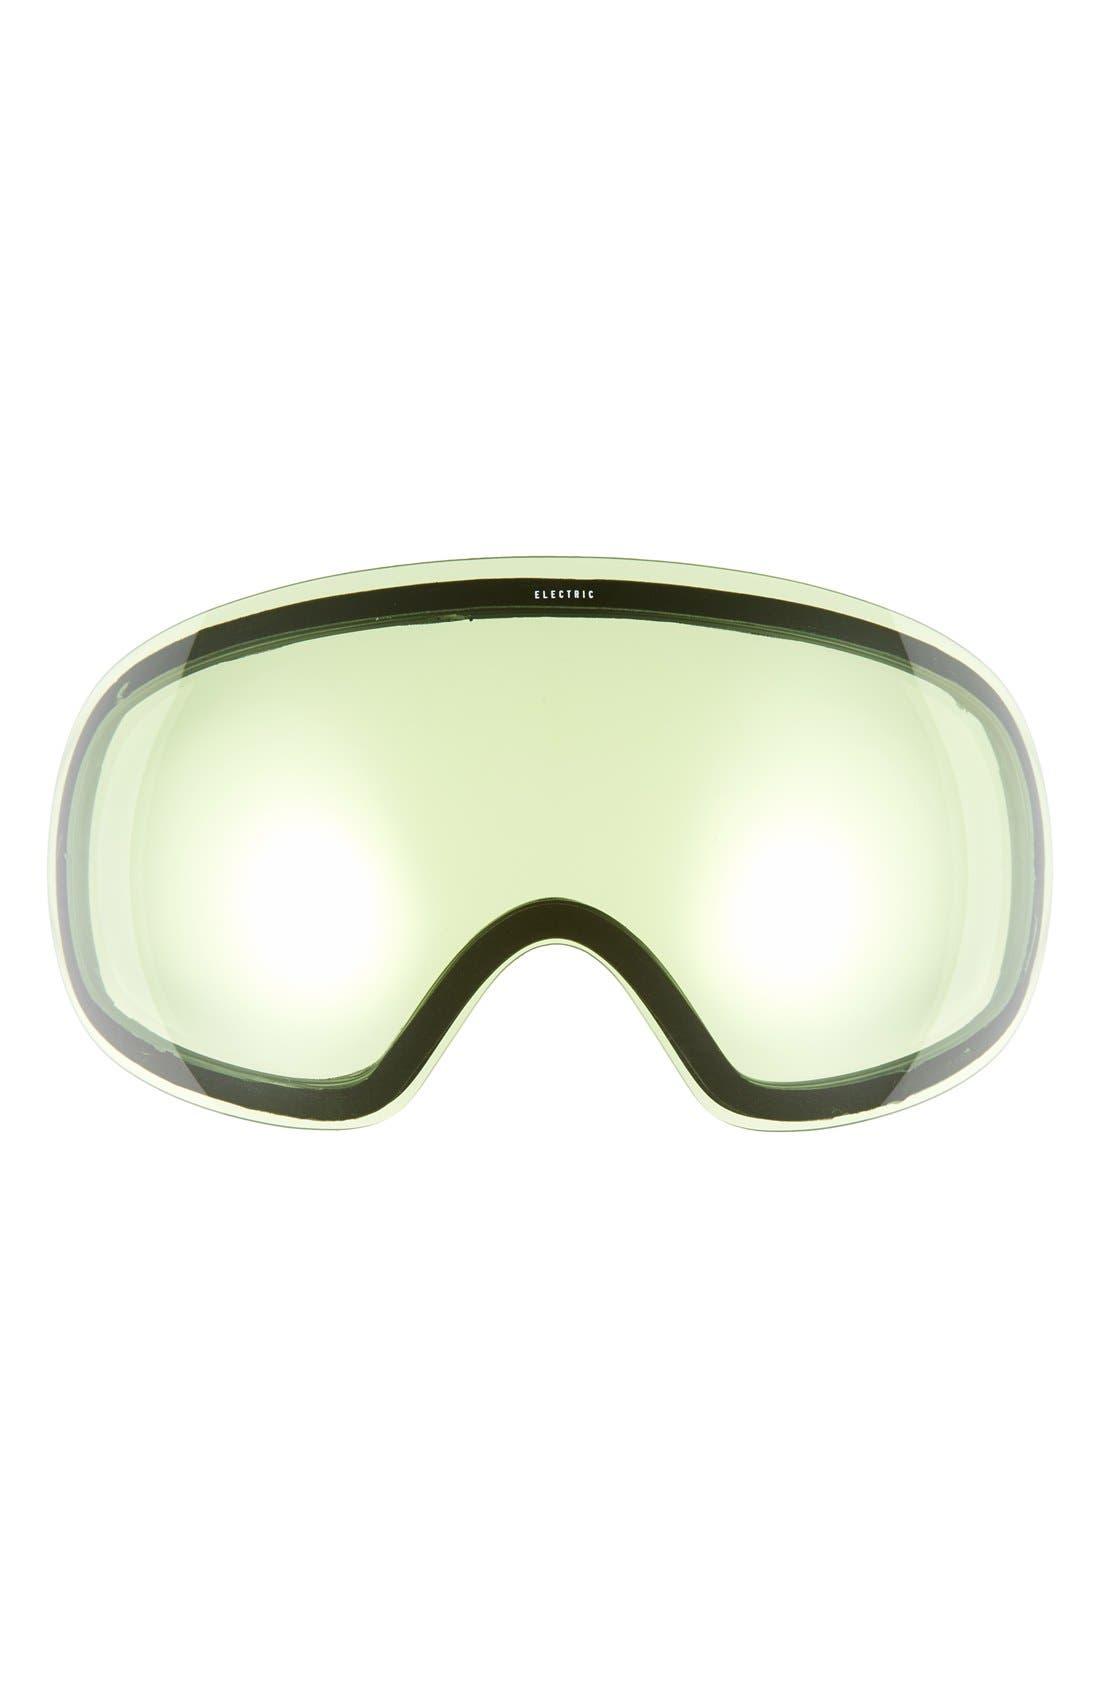 EG3 254mm Snow Goggles,                             Alternate thumbnail 26, color,